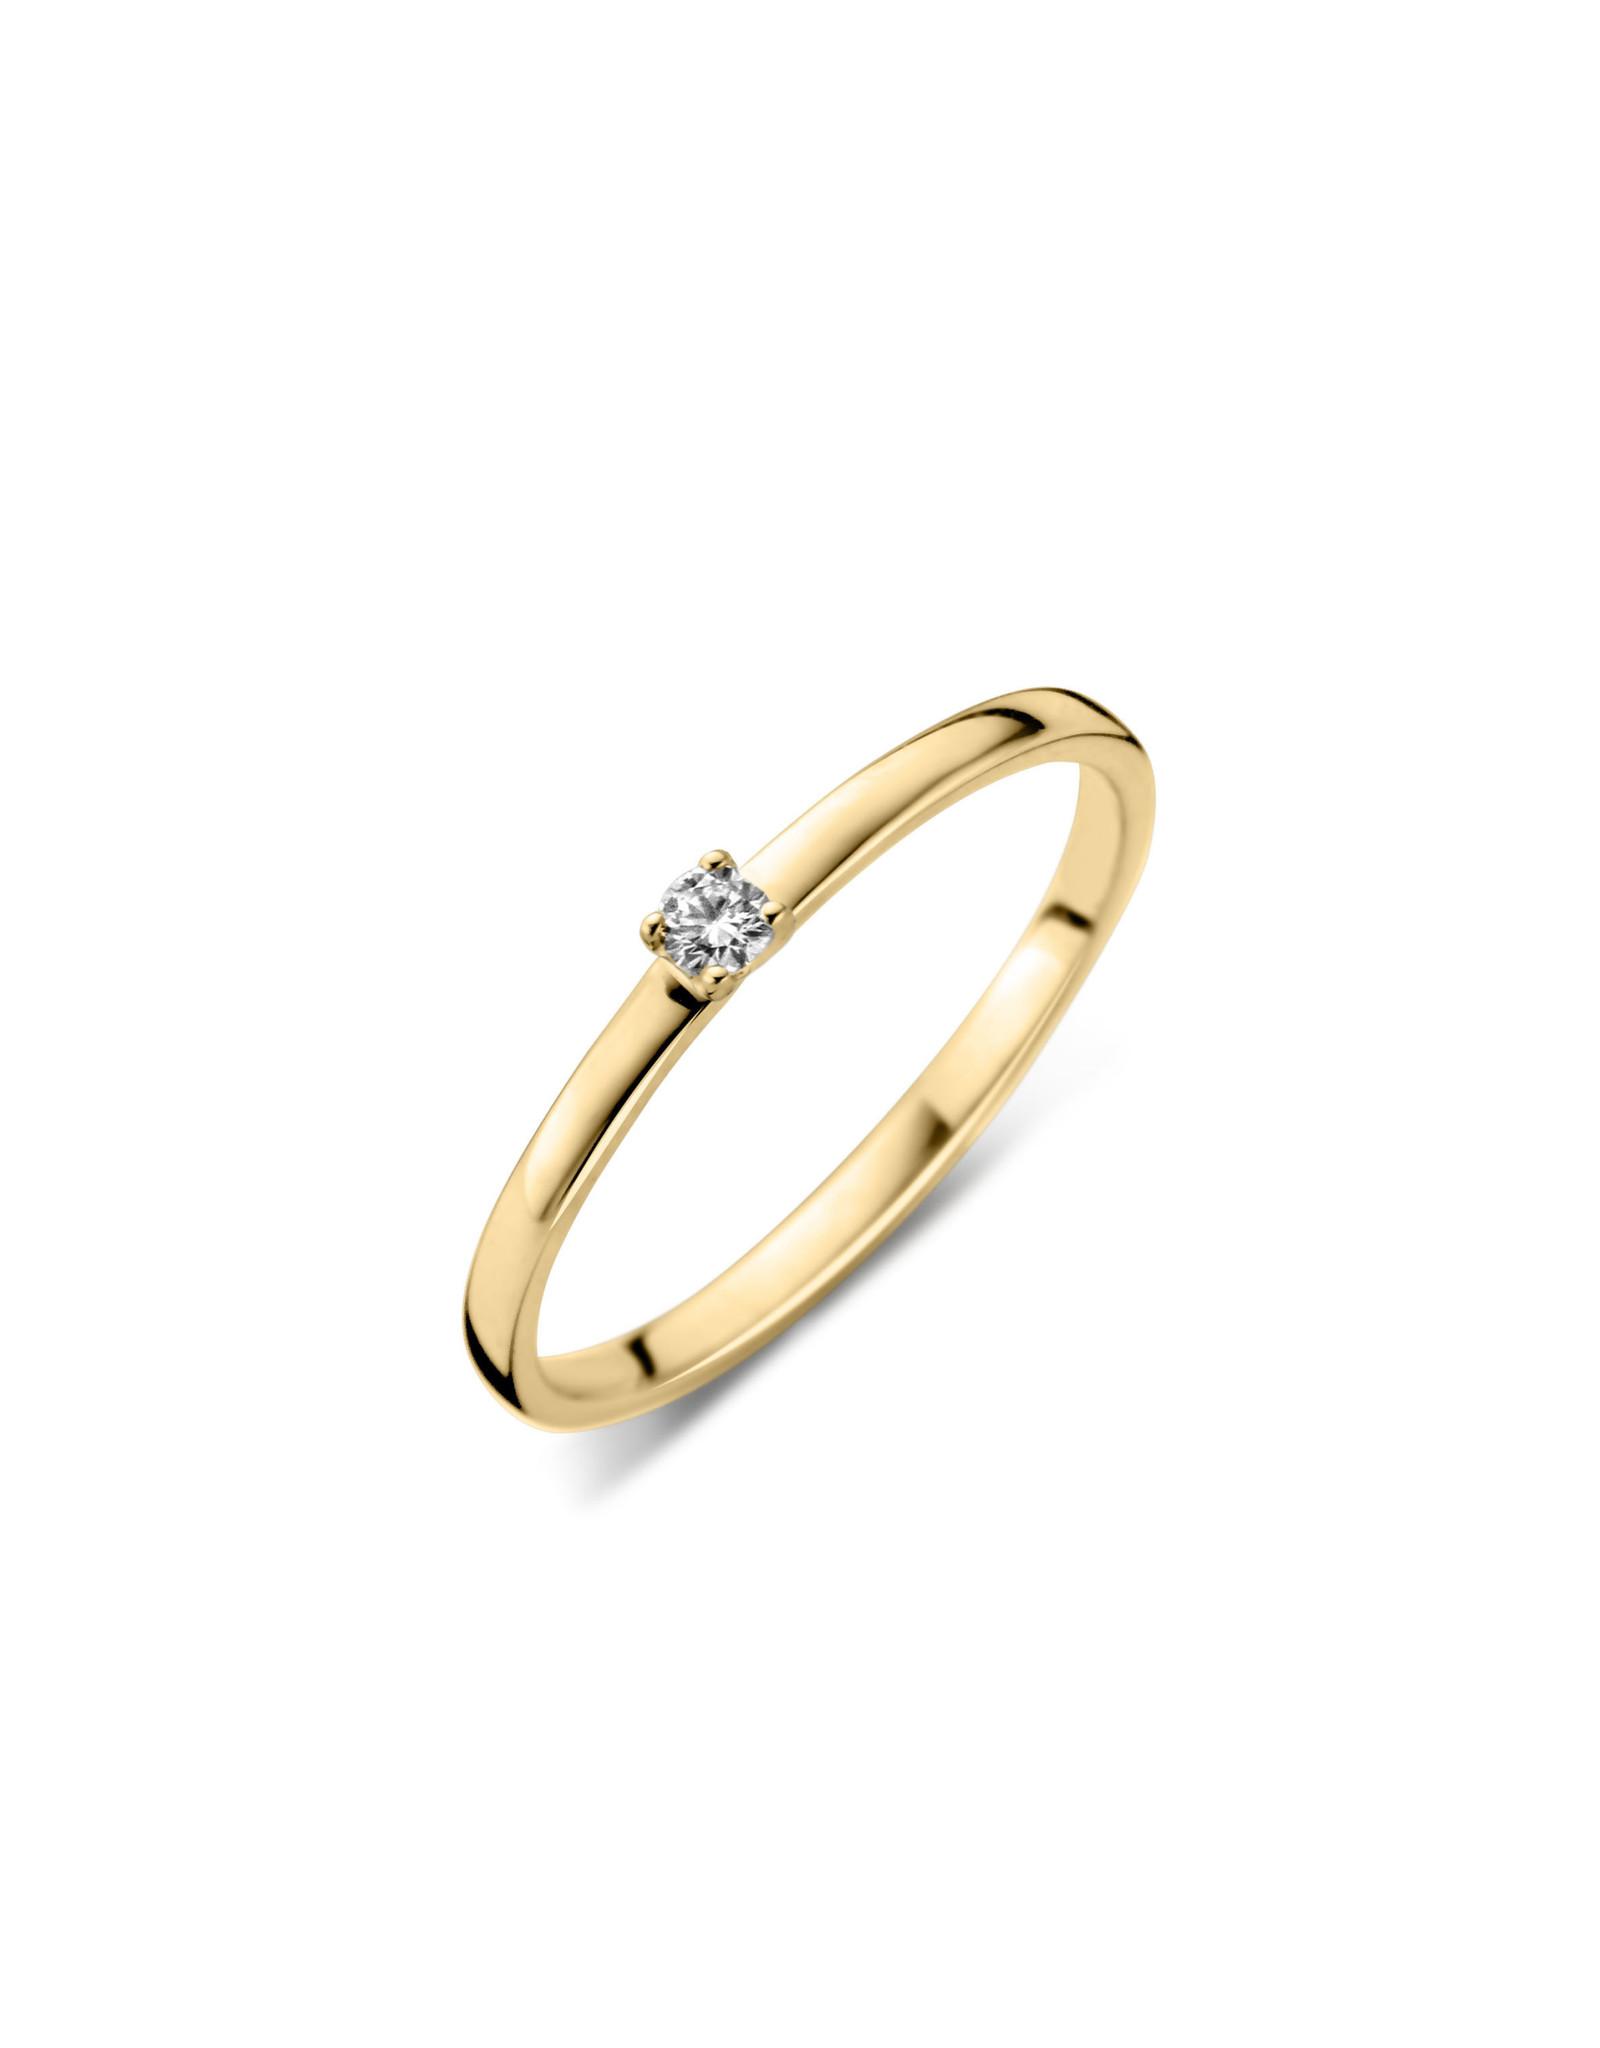 Dulci Nea Ring geel goud solitair 0.08ct maat 52 sol nr438